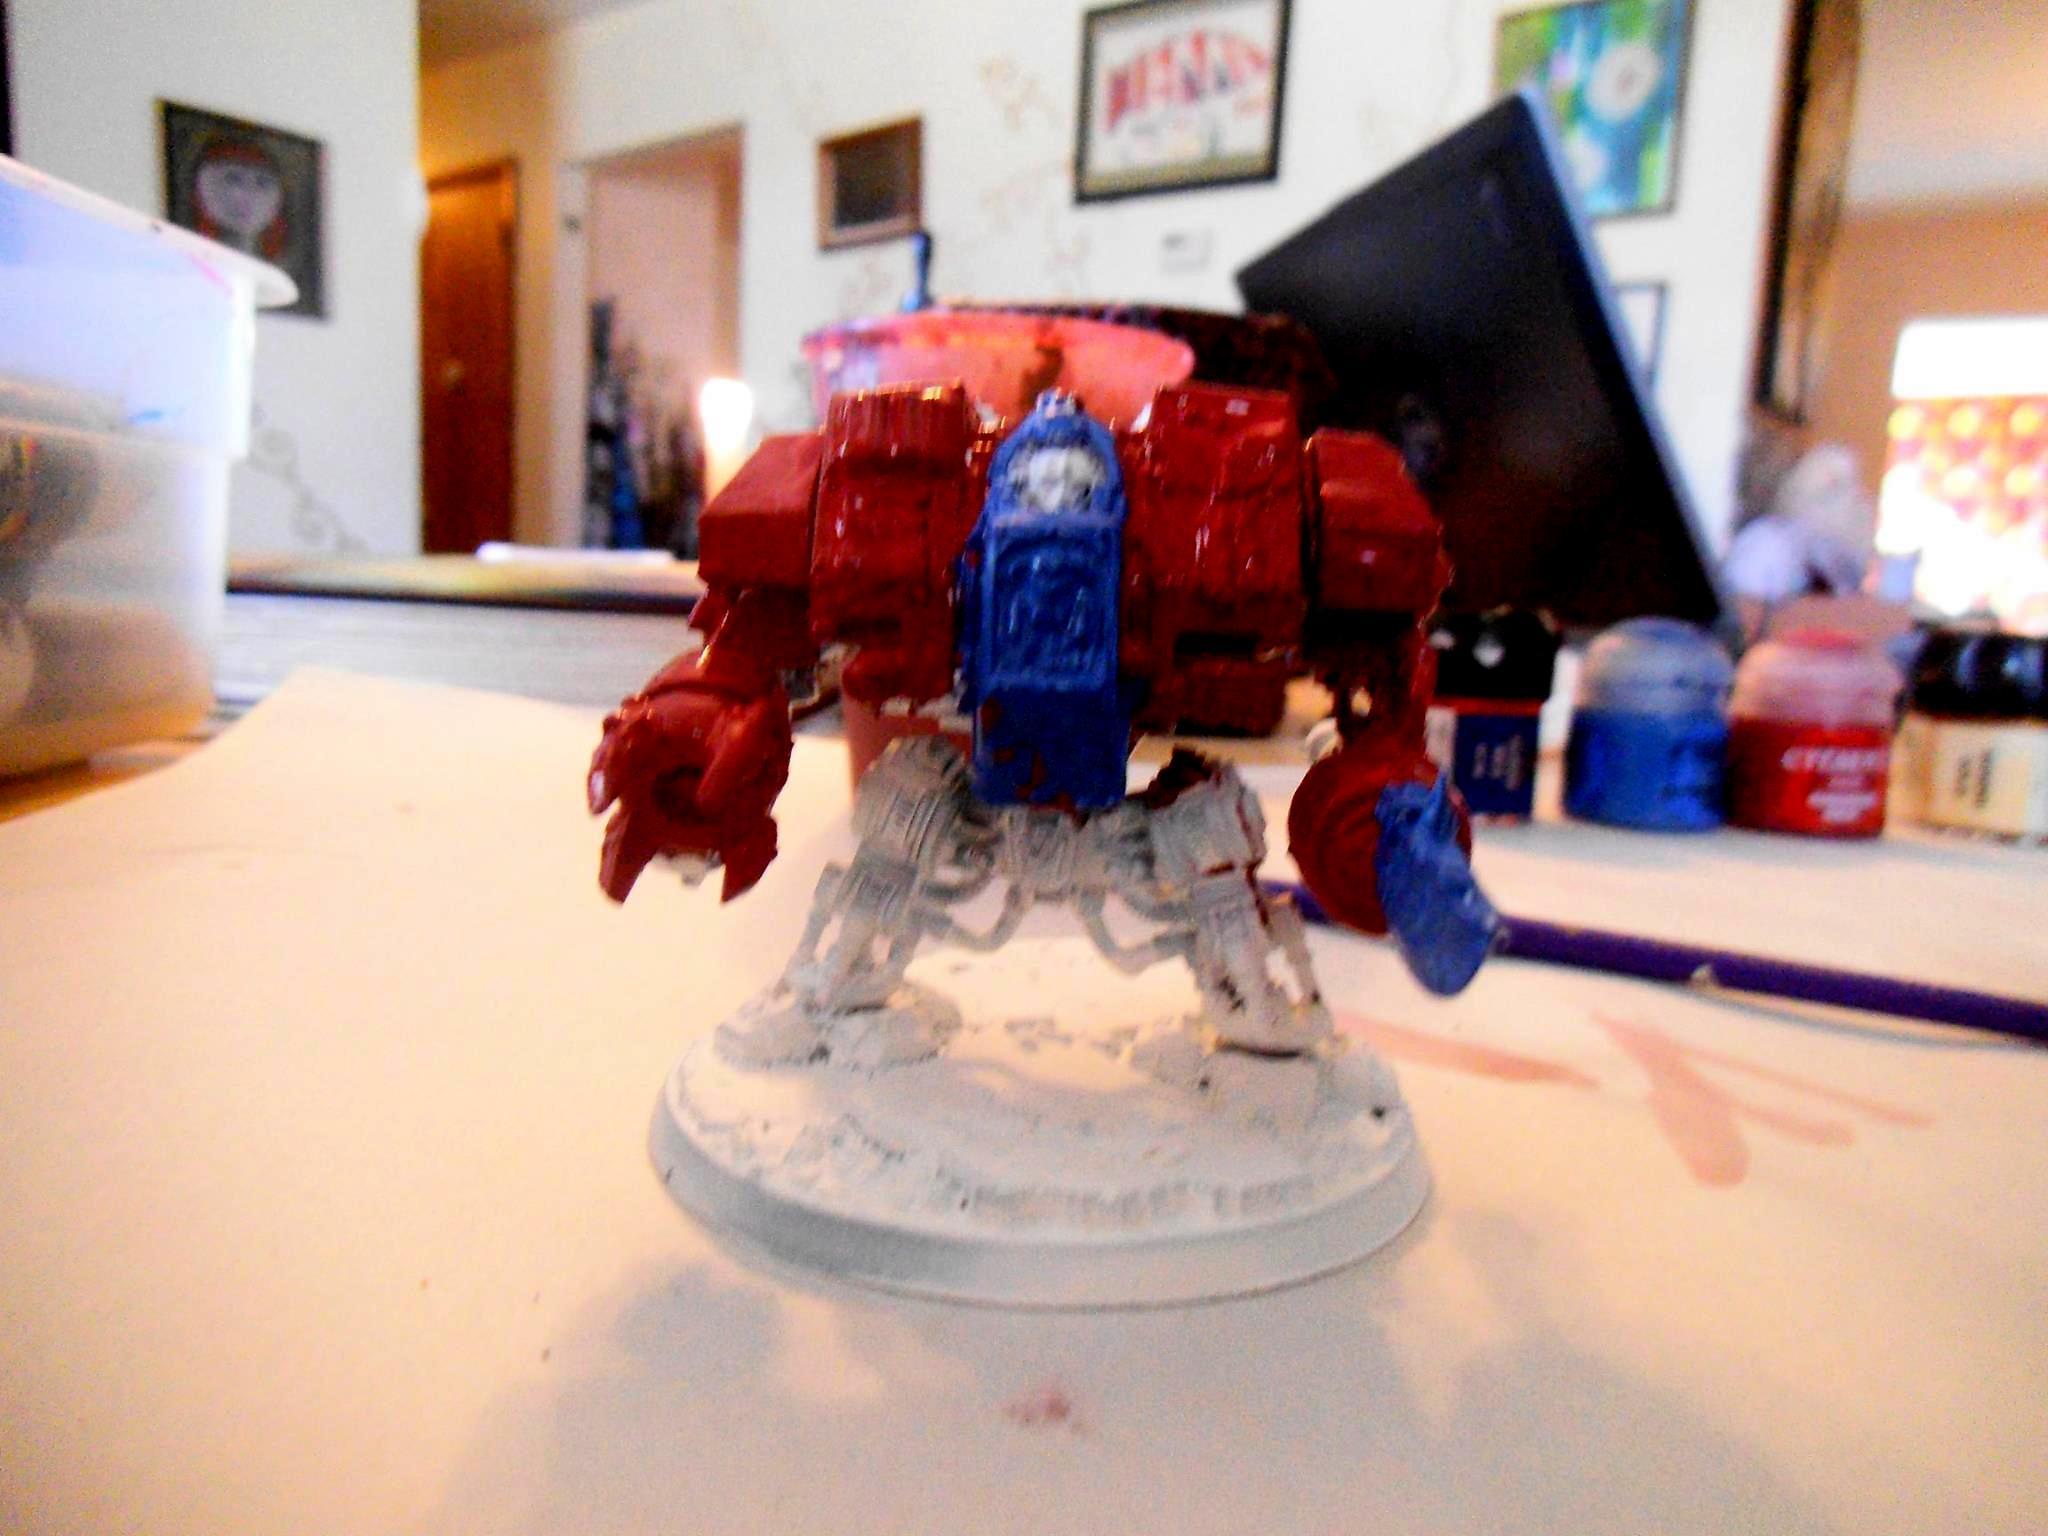 Blood Angels, Dreadnought, Space Marines, Warhammer 40,000, Wip. Warhammer 40k